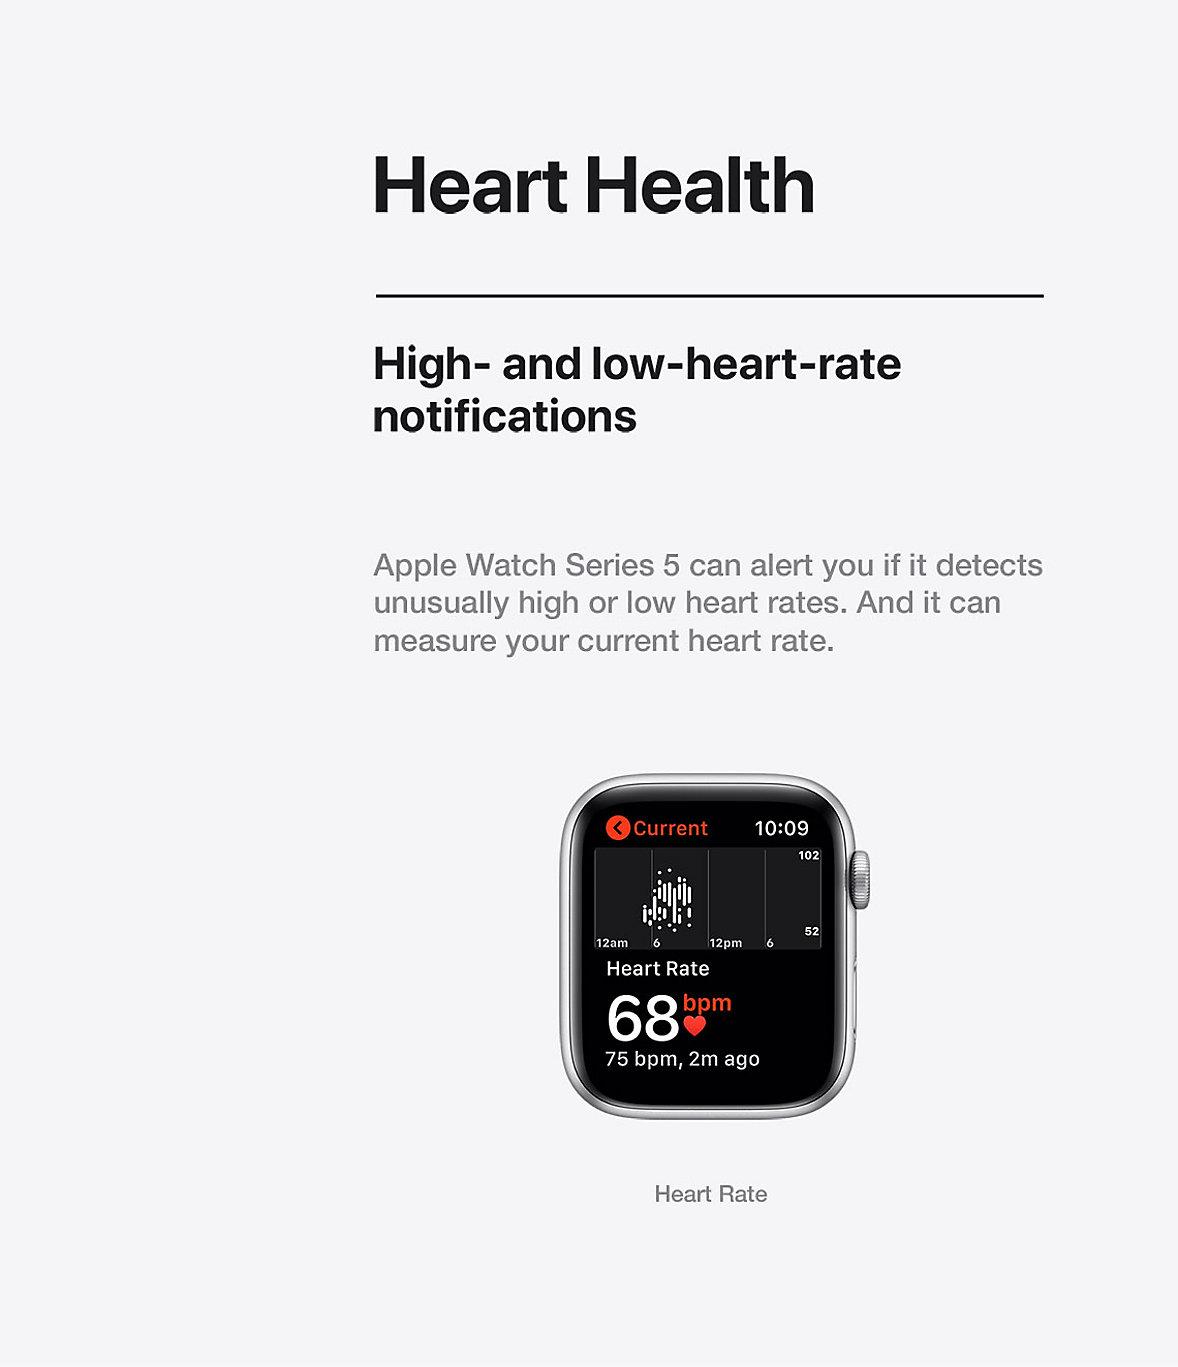 Apple Watch Heart Health Series 5